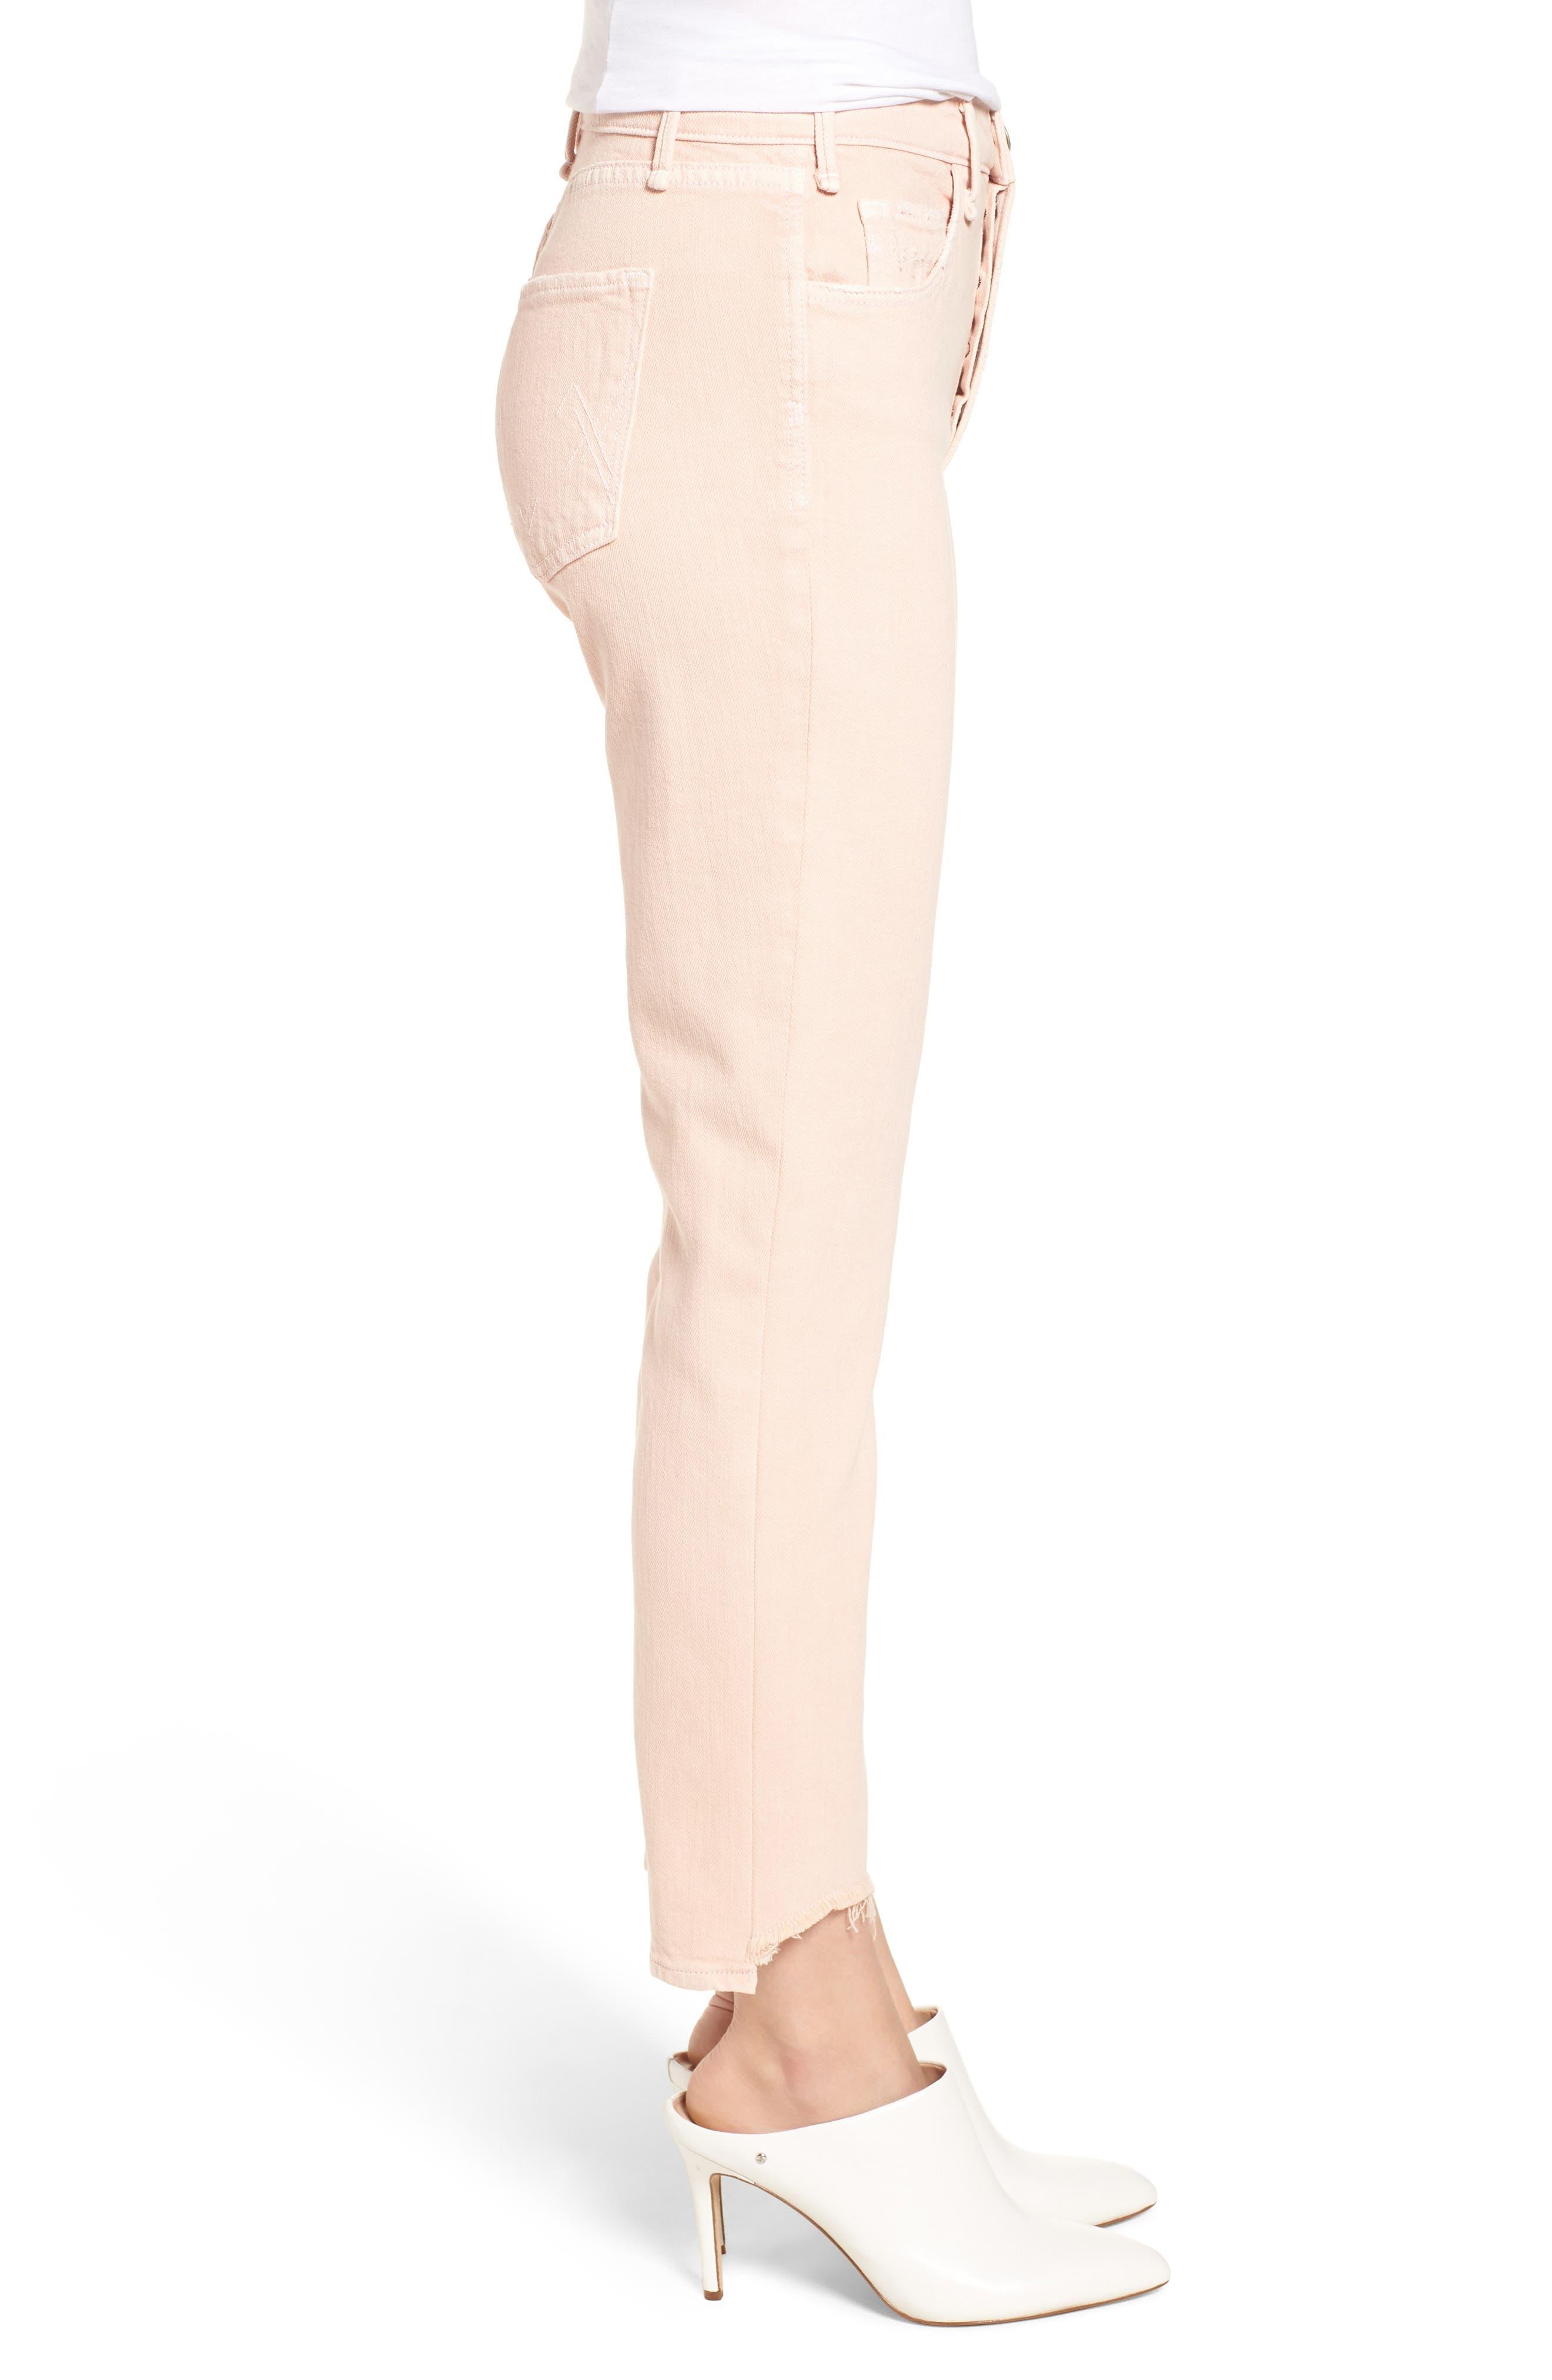 Valletta High Waist Crop Straight Leg Jeans,                             Alternate thumbnail 3, color,                             Punch Pink